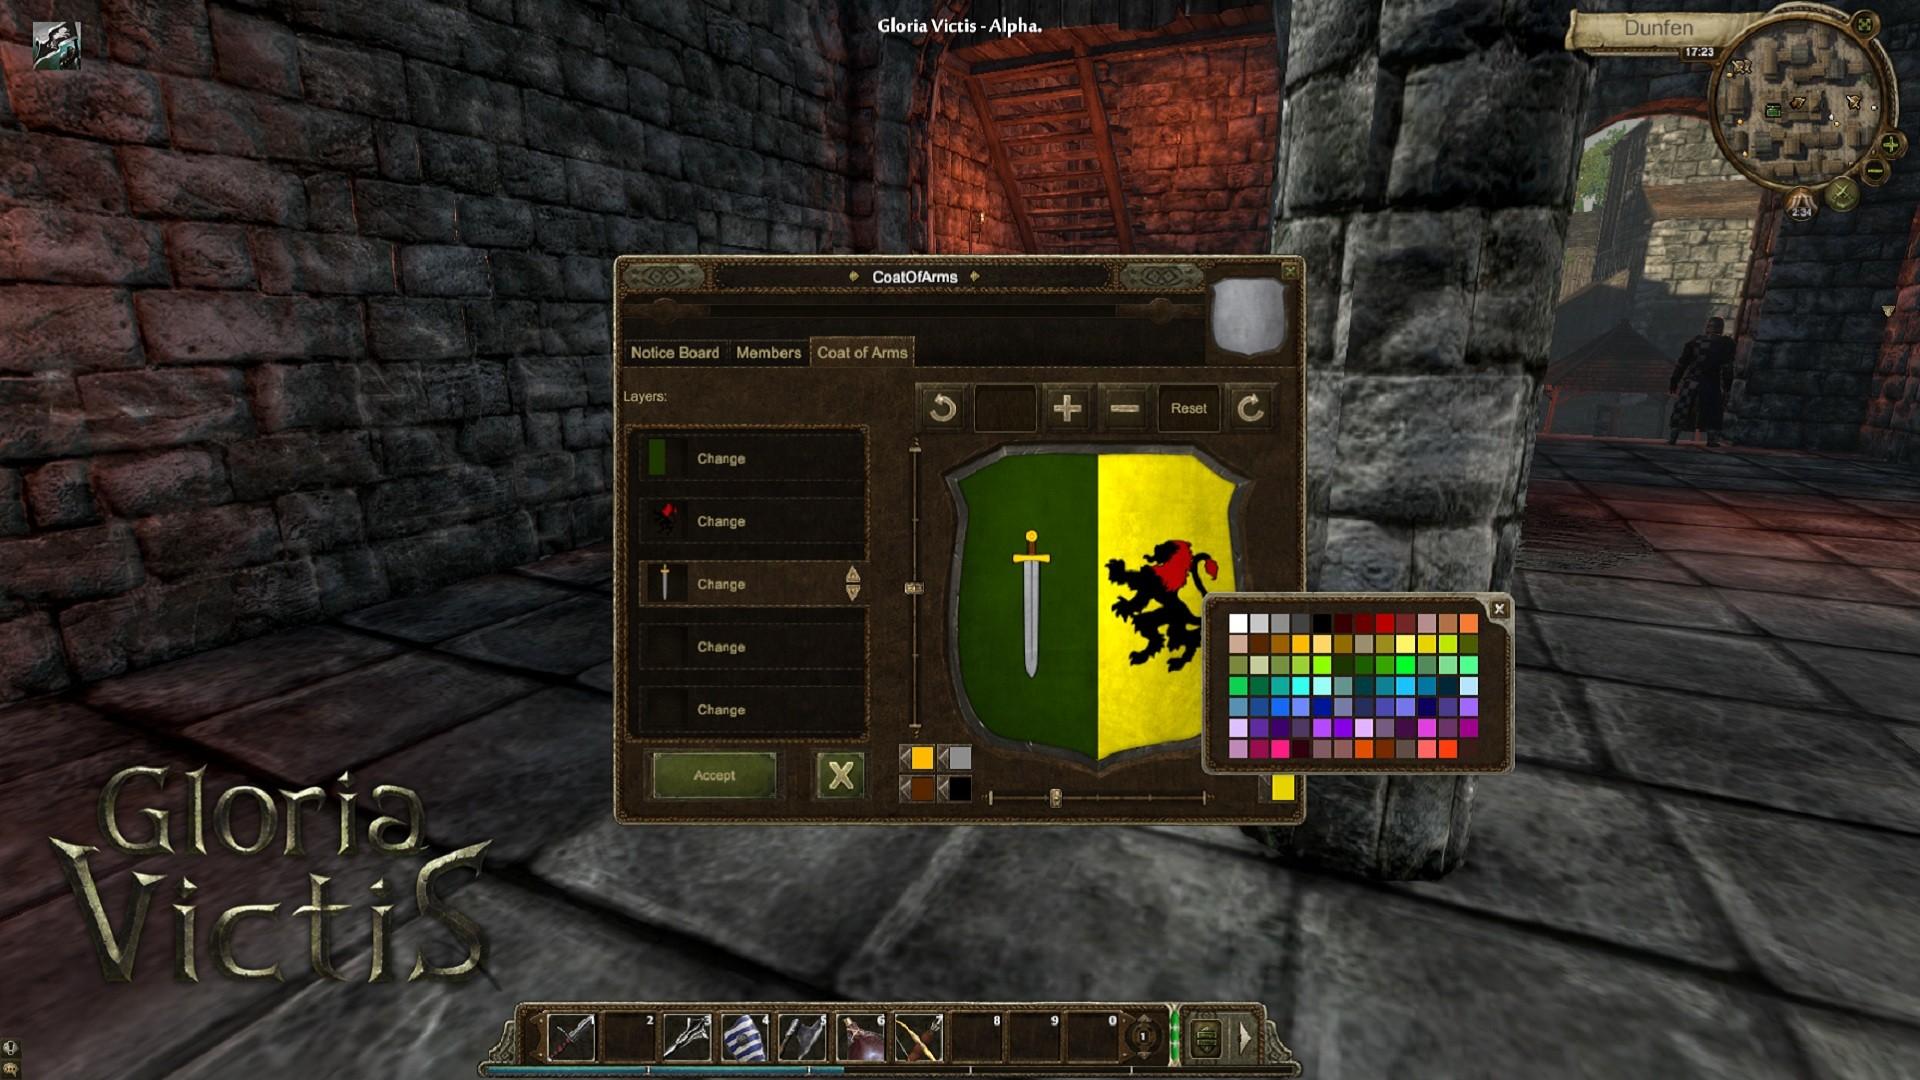 Gloria Victis - Coat of Arms editor - MMORPG com Gloria